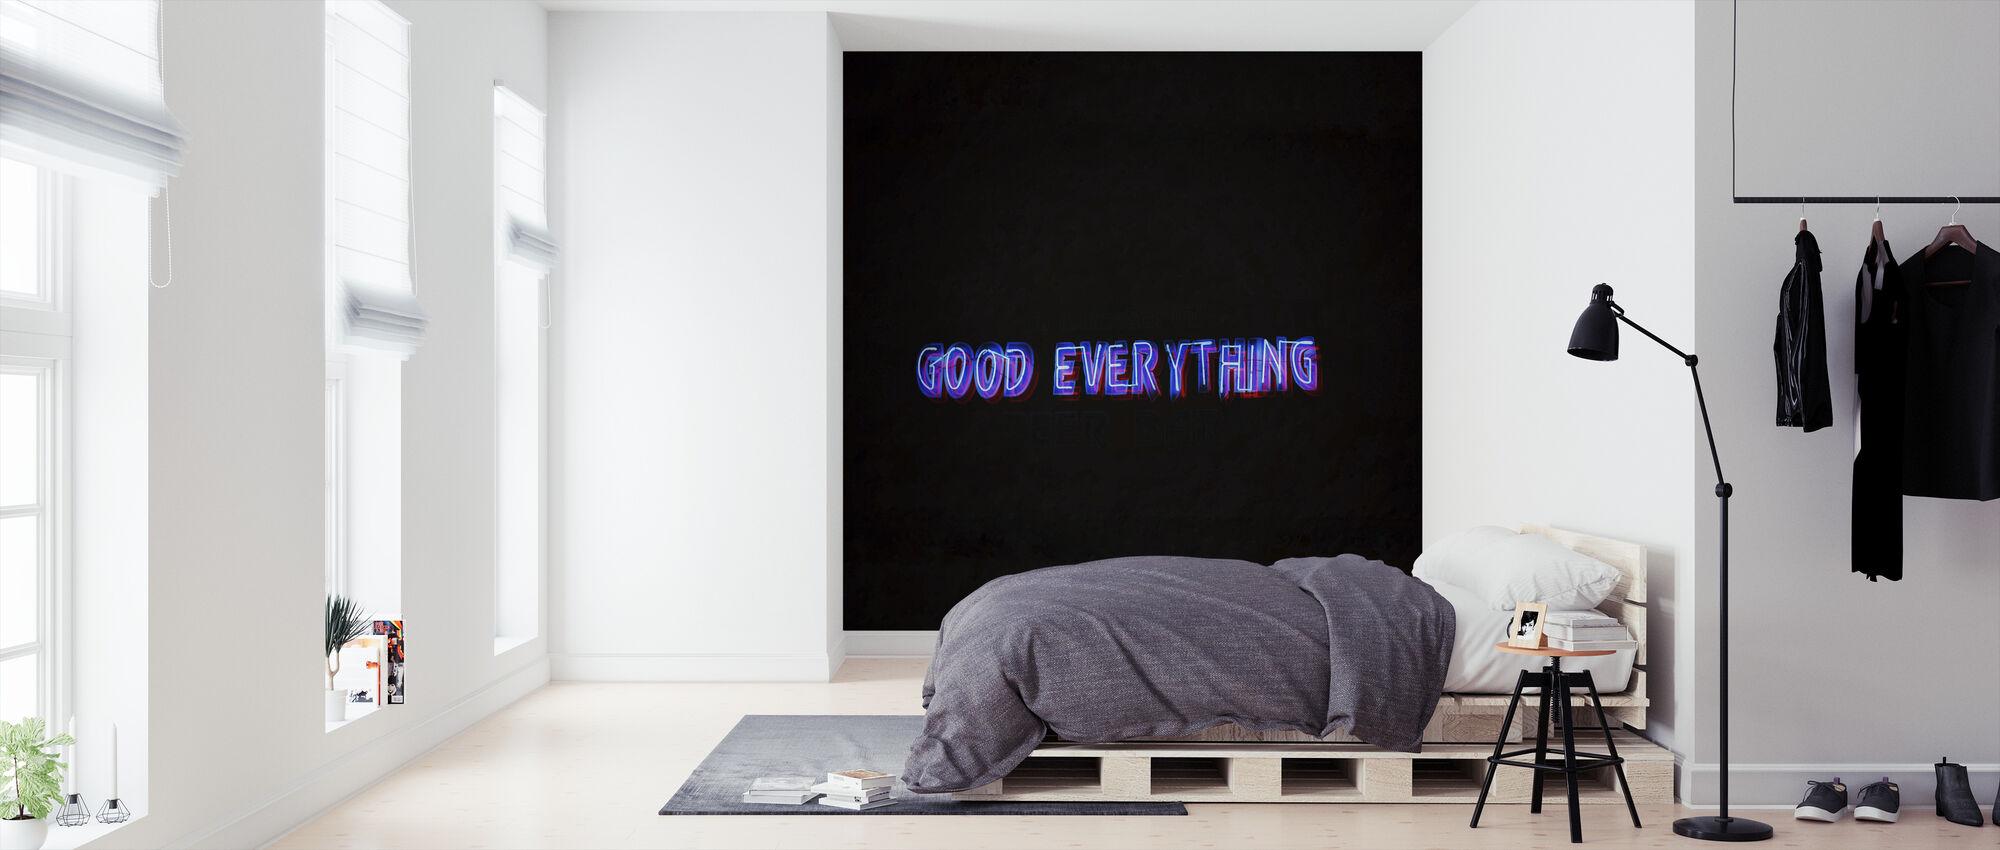 Alles goed - Behang - Slaapkamer